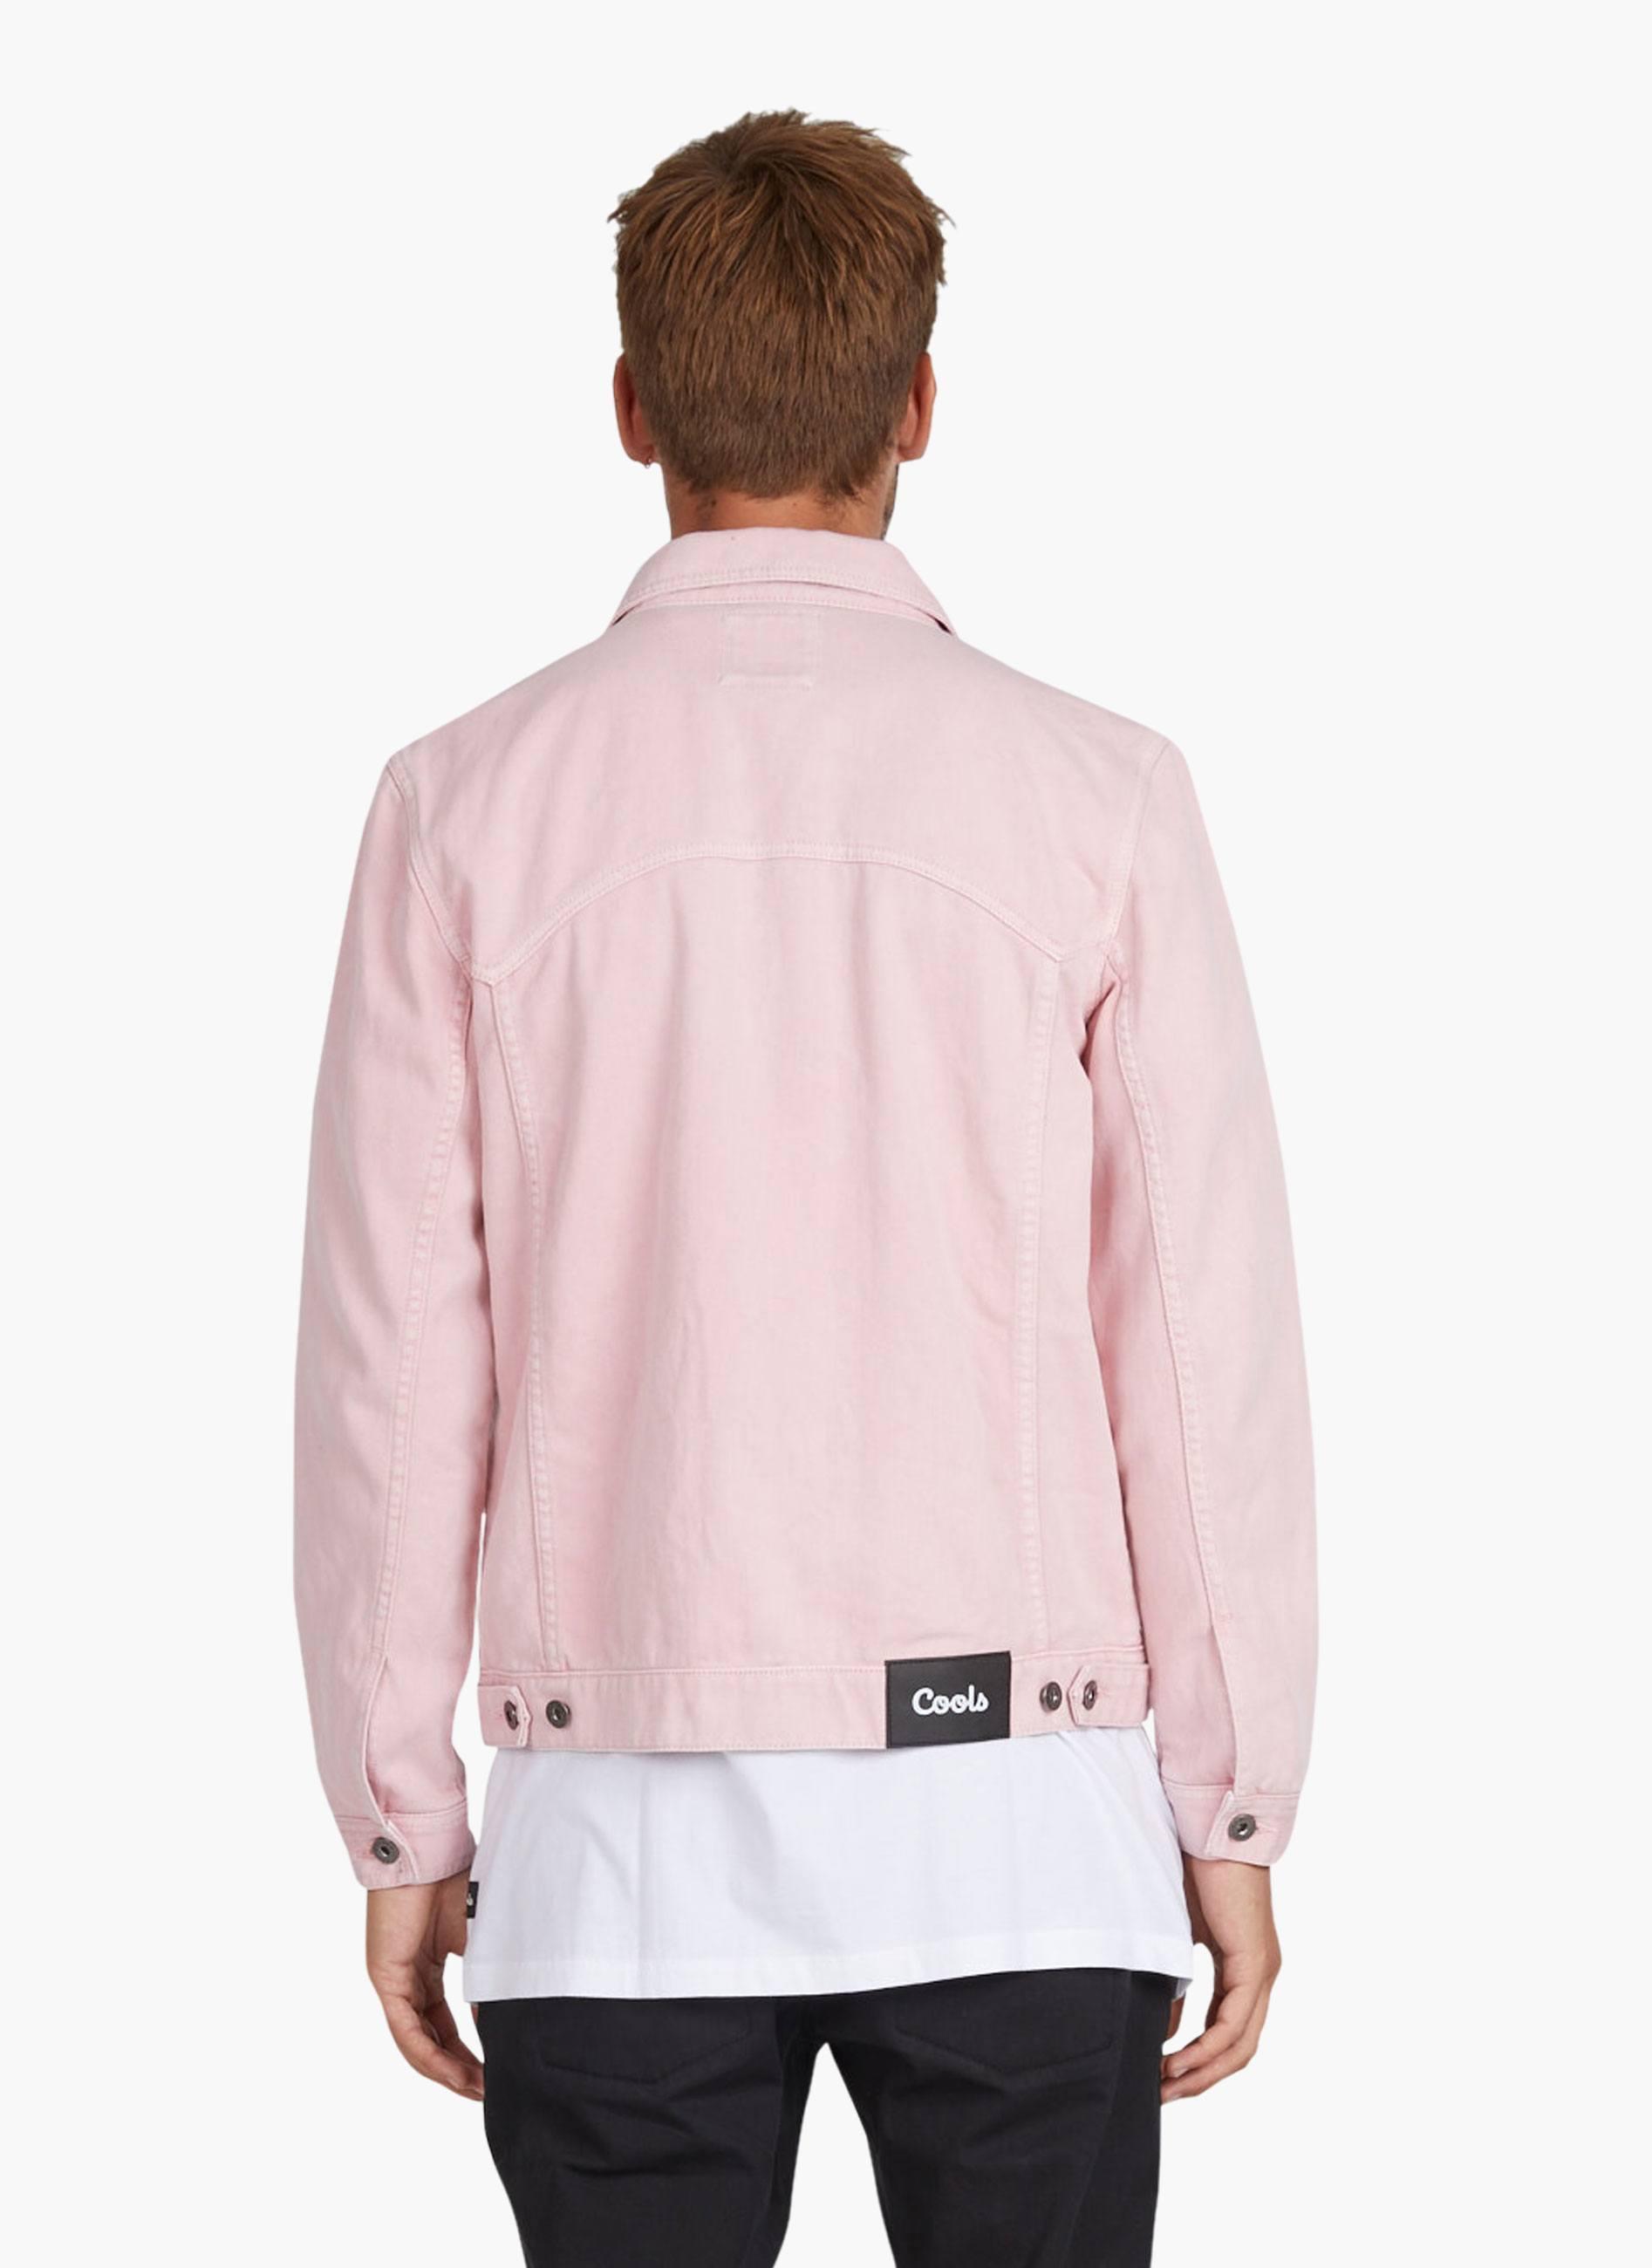 BARNEY-COOLS-B.Rigid-Jacket-Pink-04.jpg